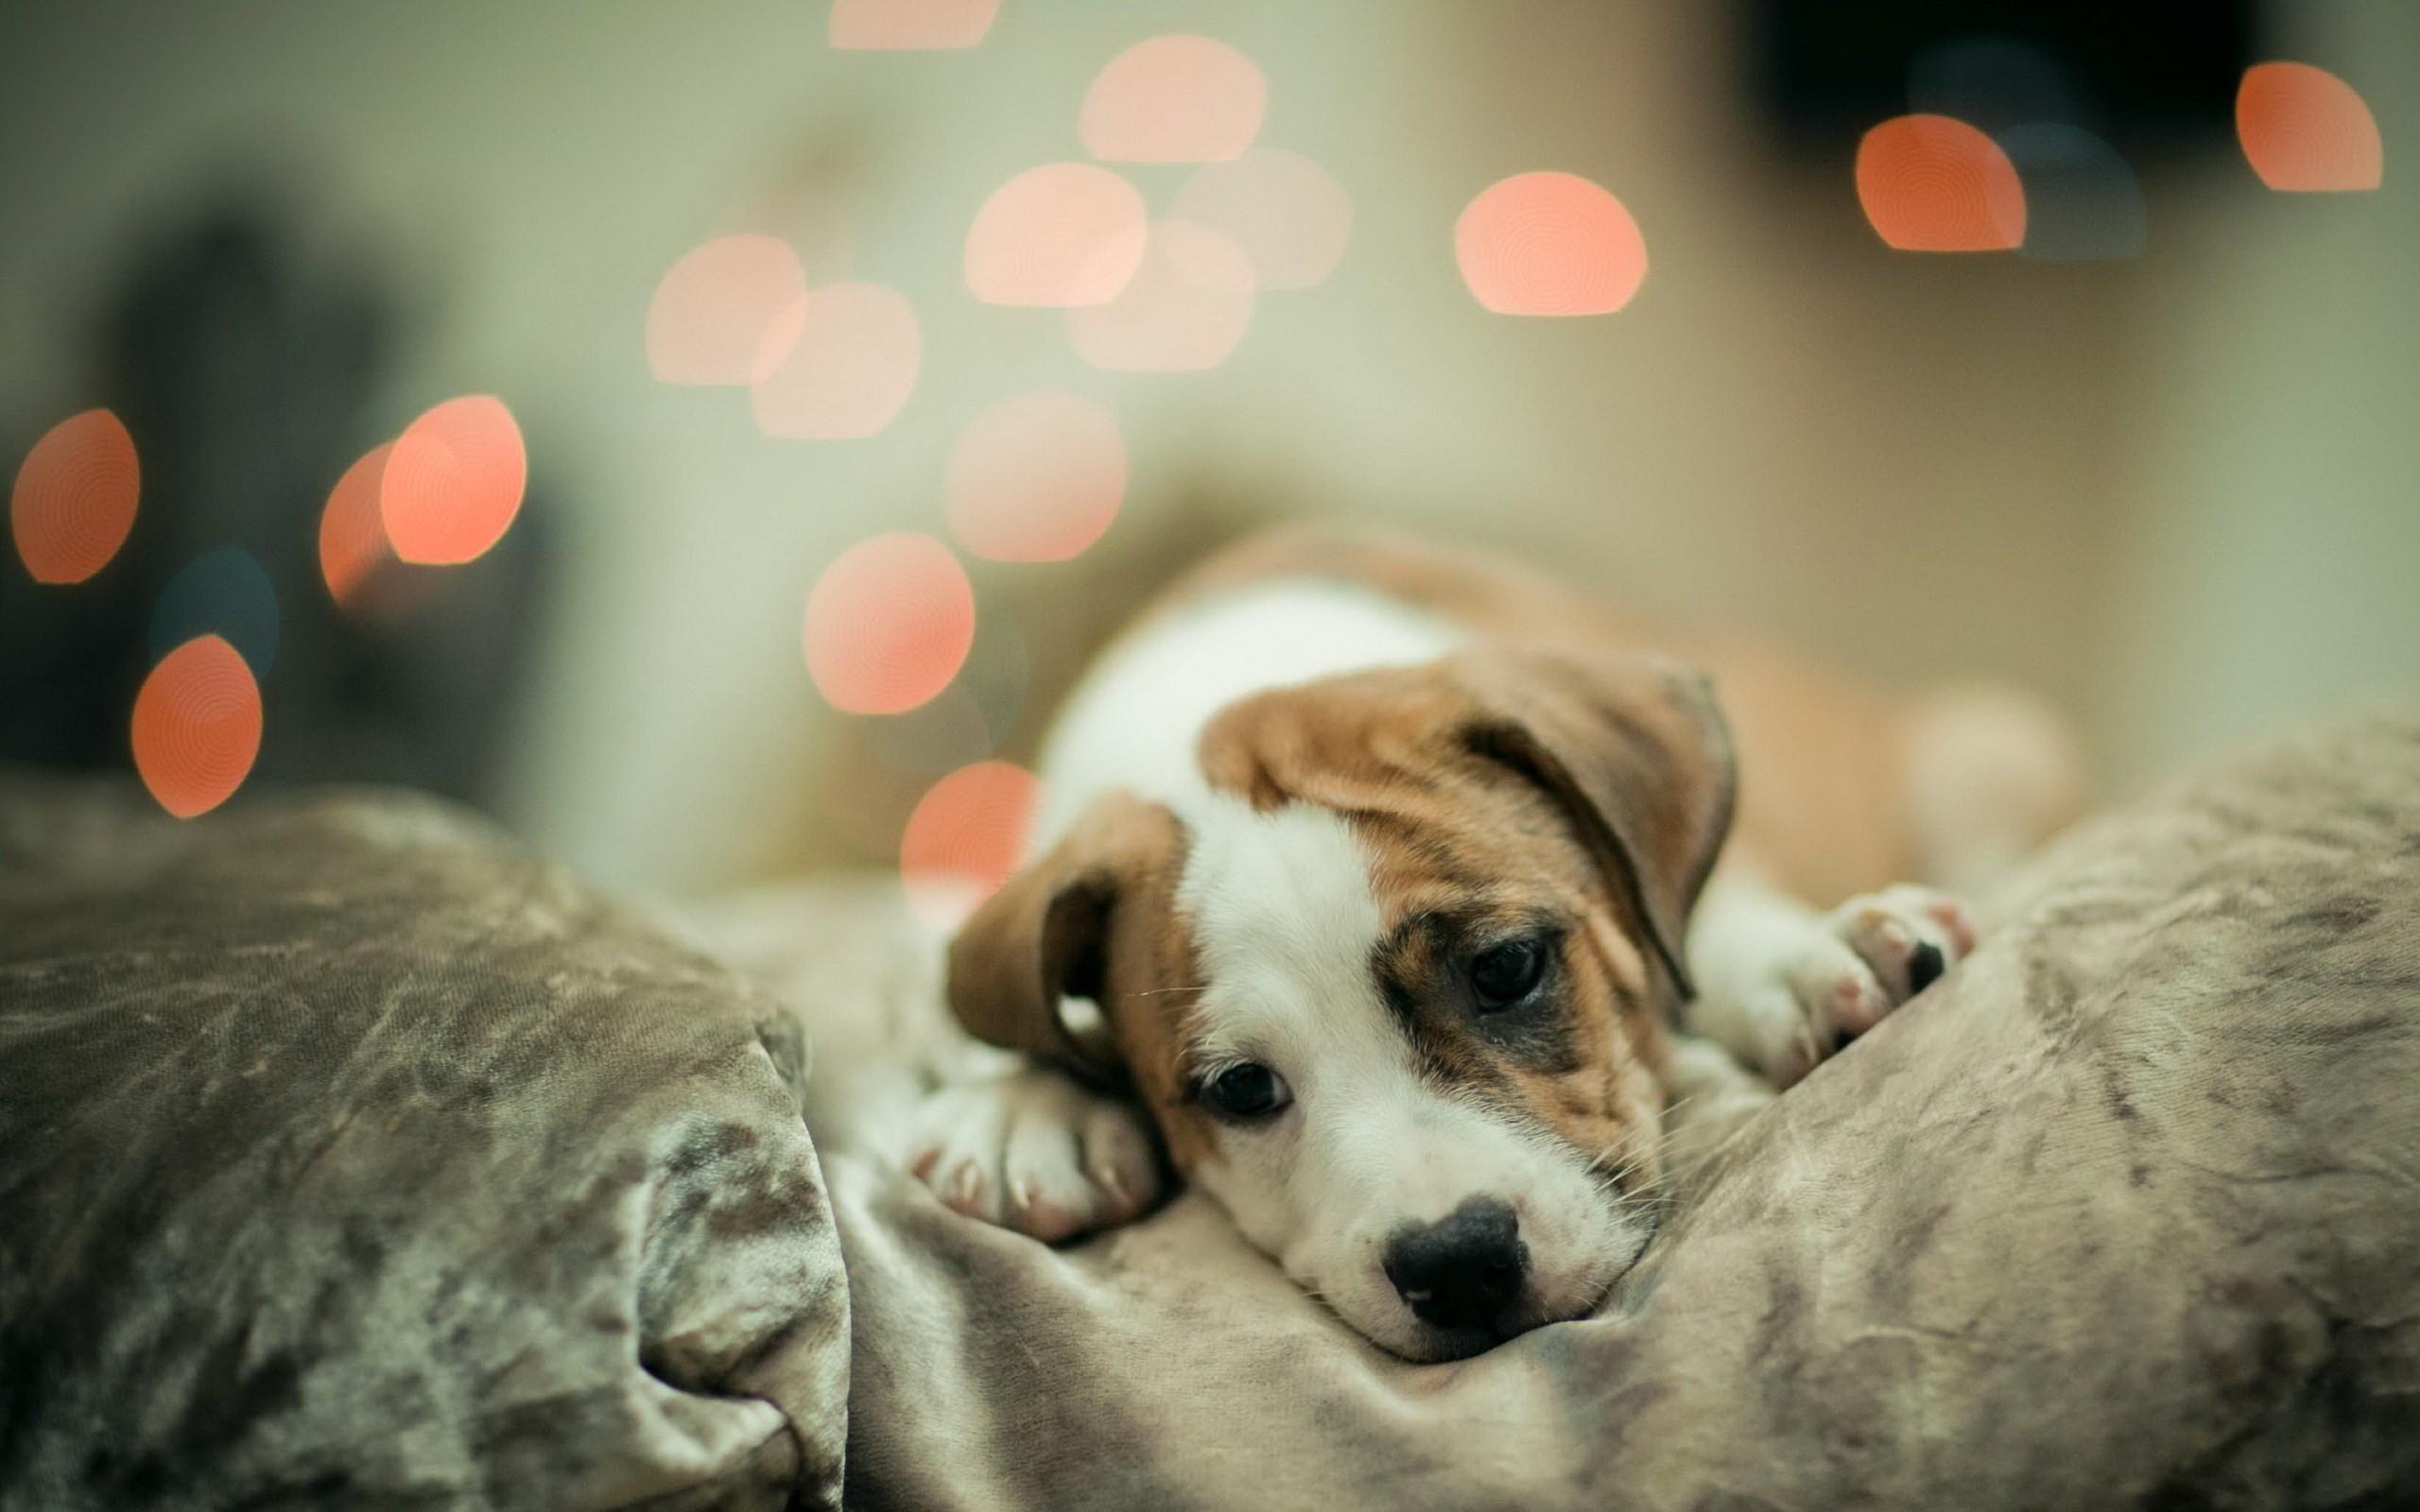 cute-dog-wallpaper-3